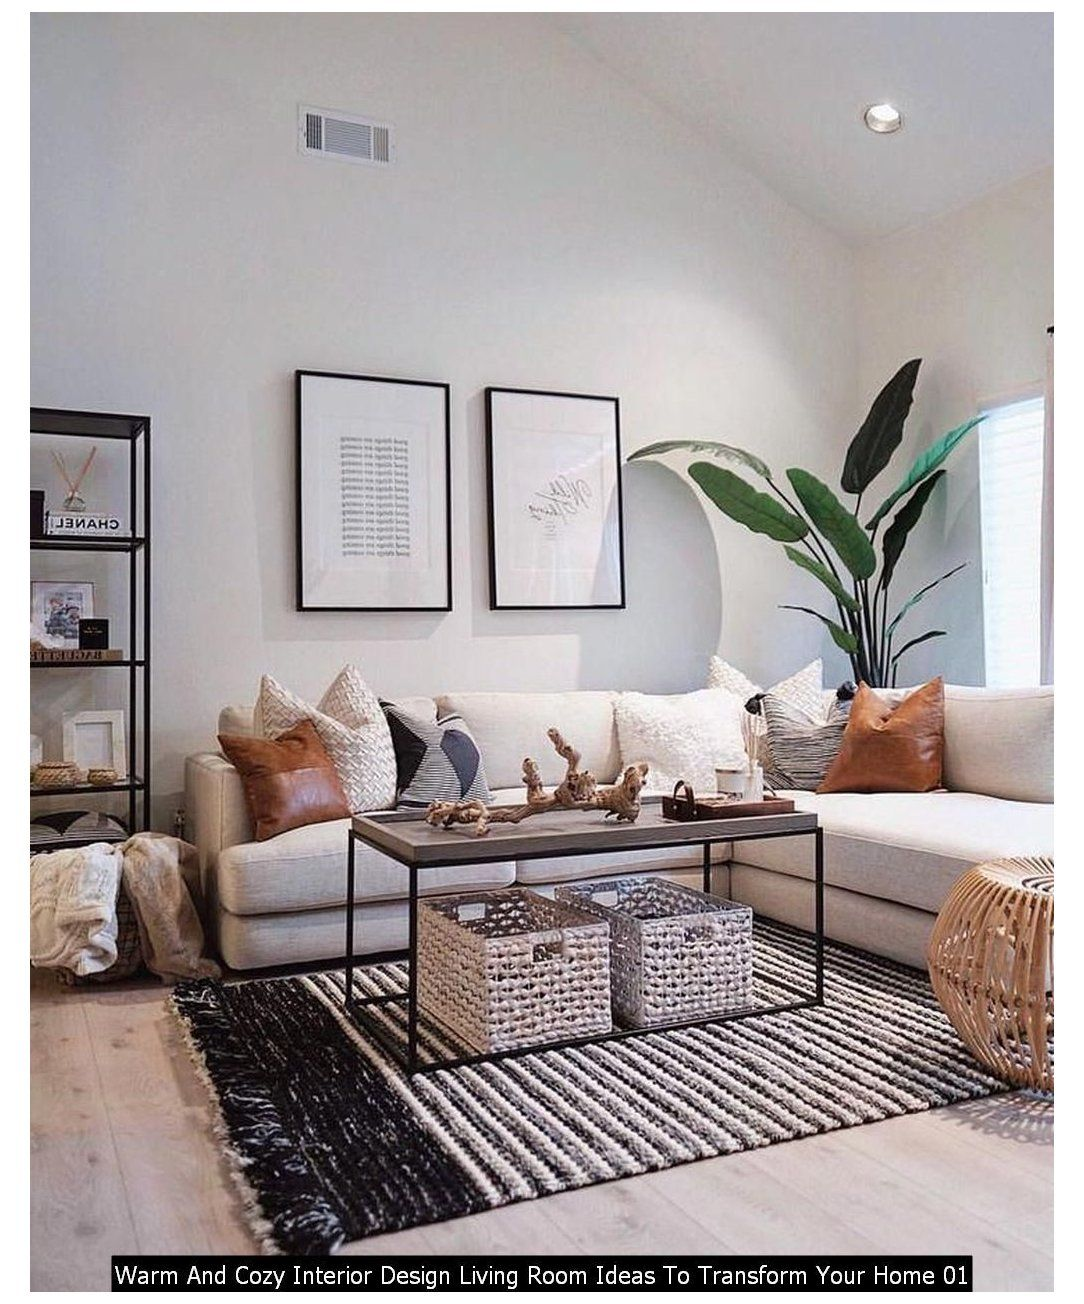 20 Warm And Cozy Interior Design Living Room Ideas To Transform Your Home Home Cozy Interior Design Living Room Scandinavian Scandinavian Decor Living Room Warm living room decor